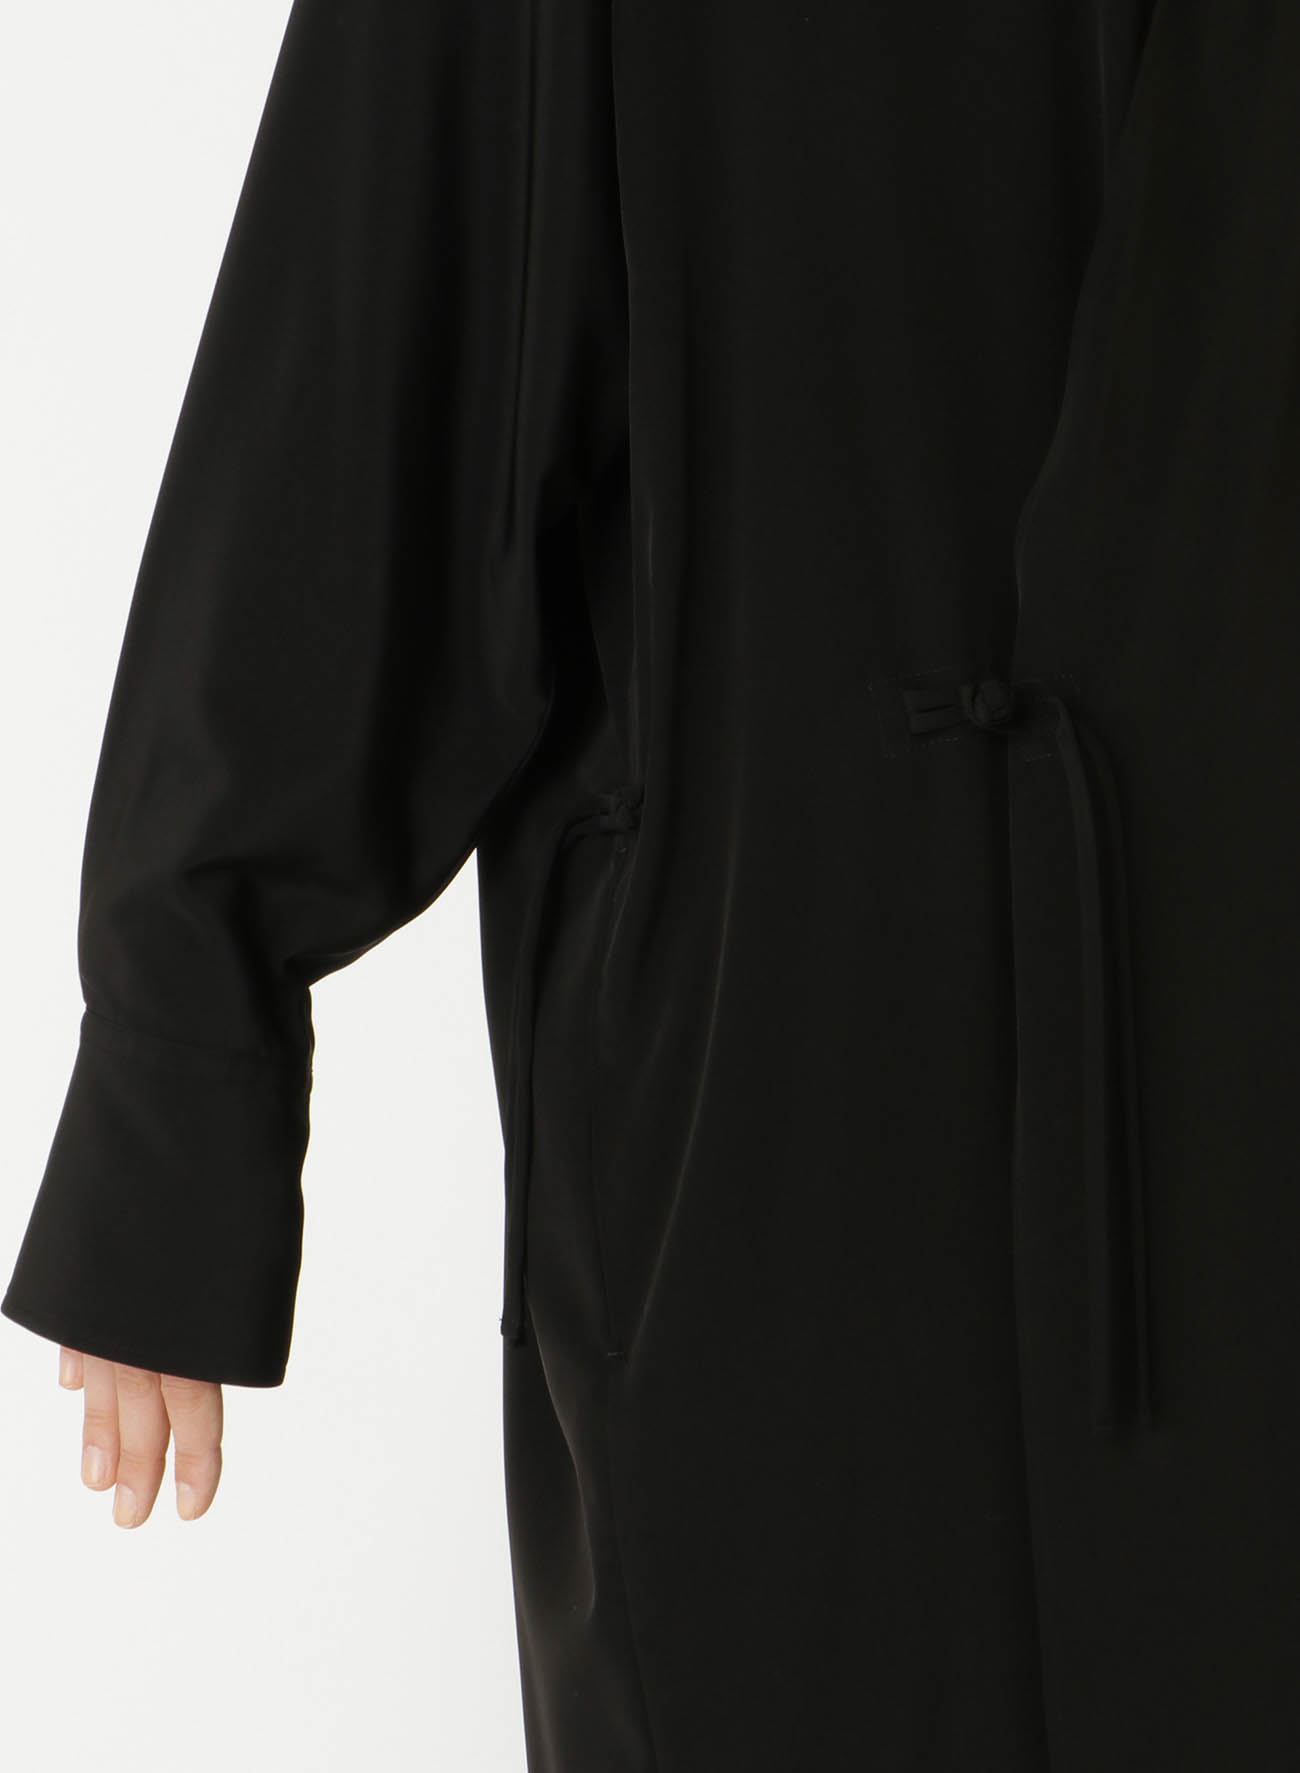 TRIACETATE POLY TUSSAR CHINA SHIRT DRESS